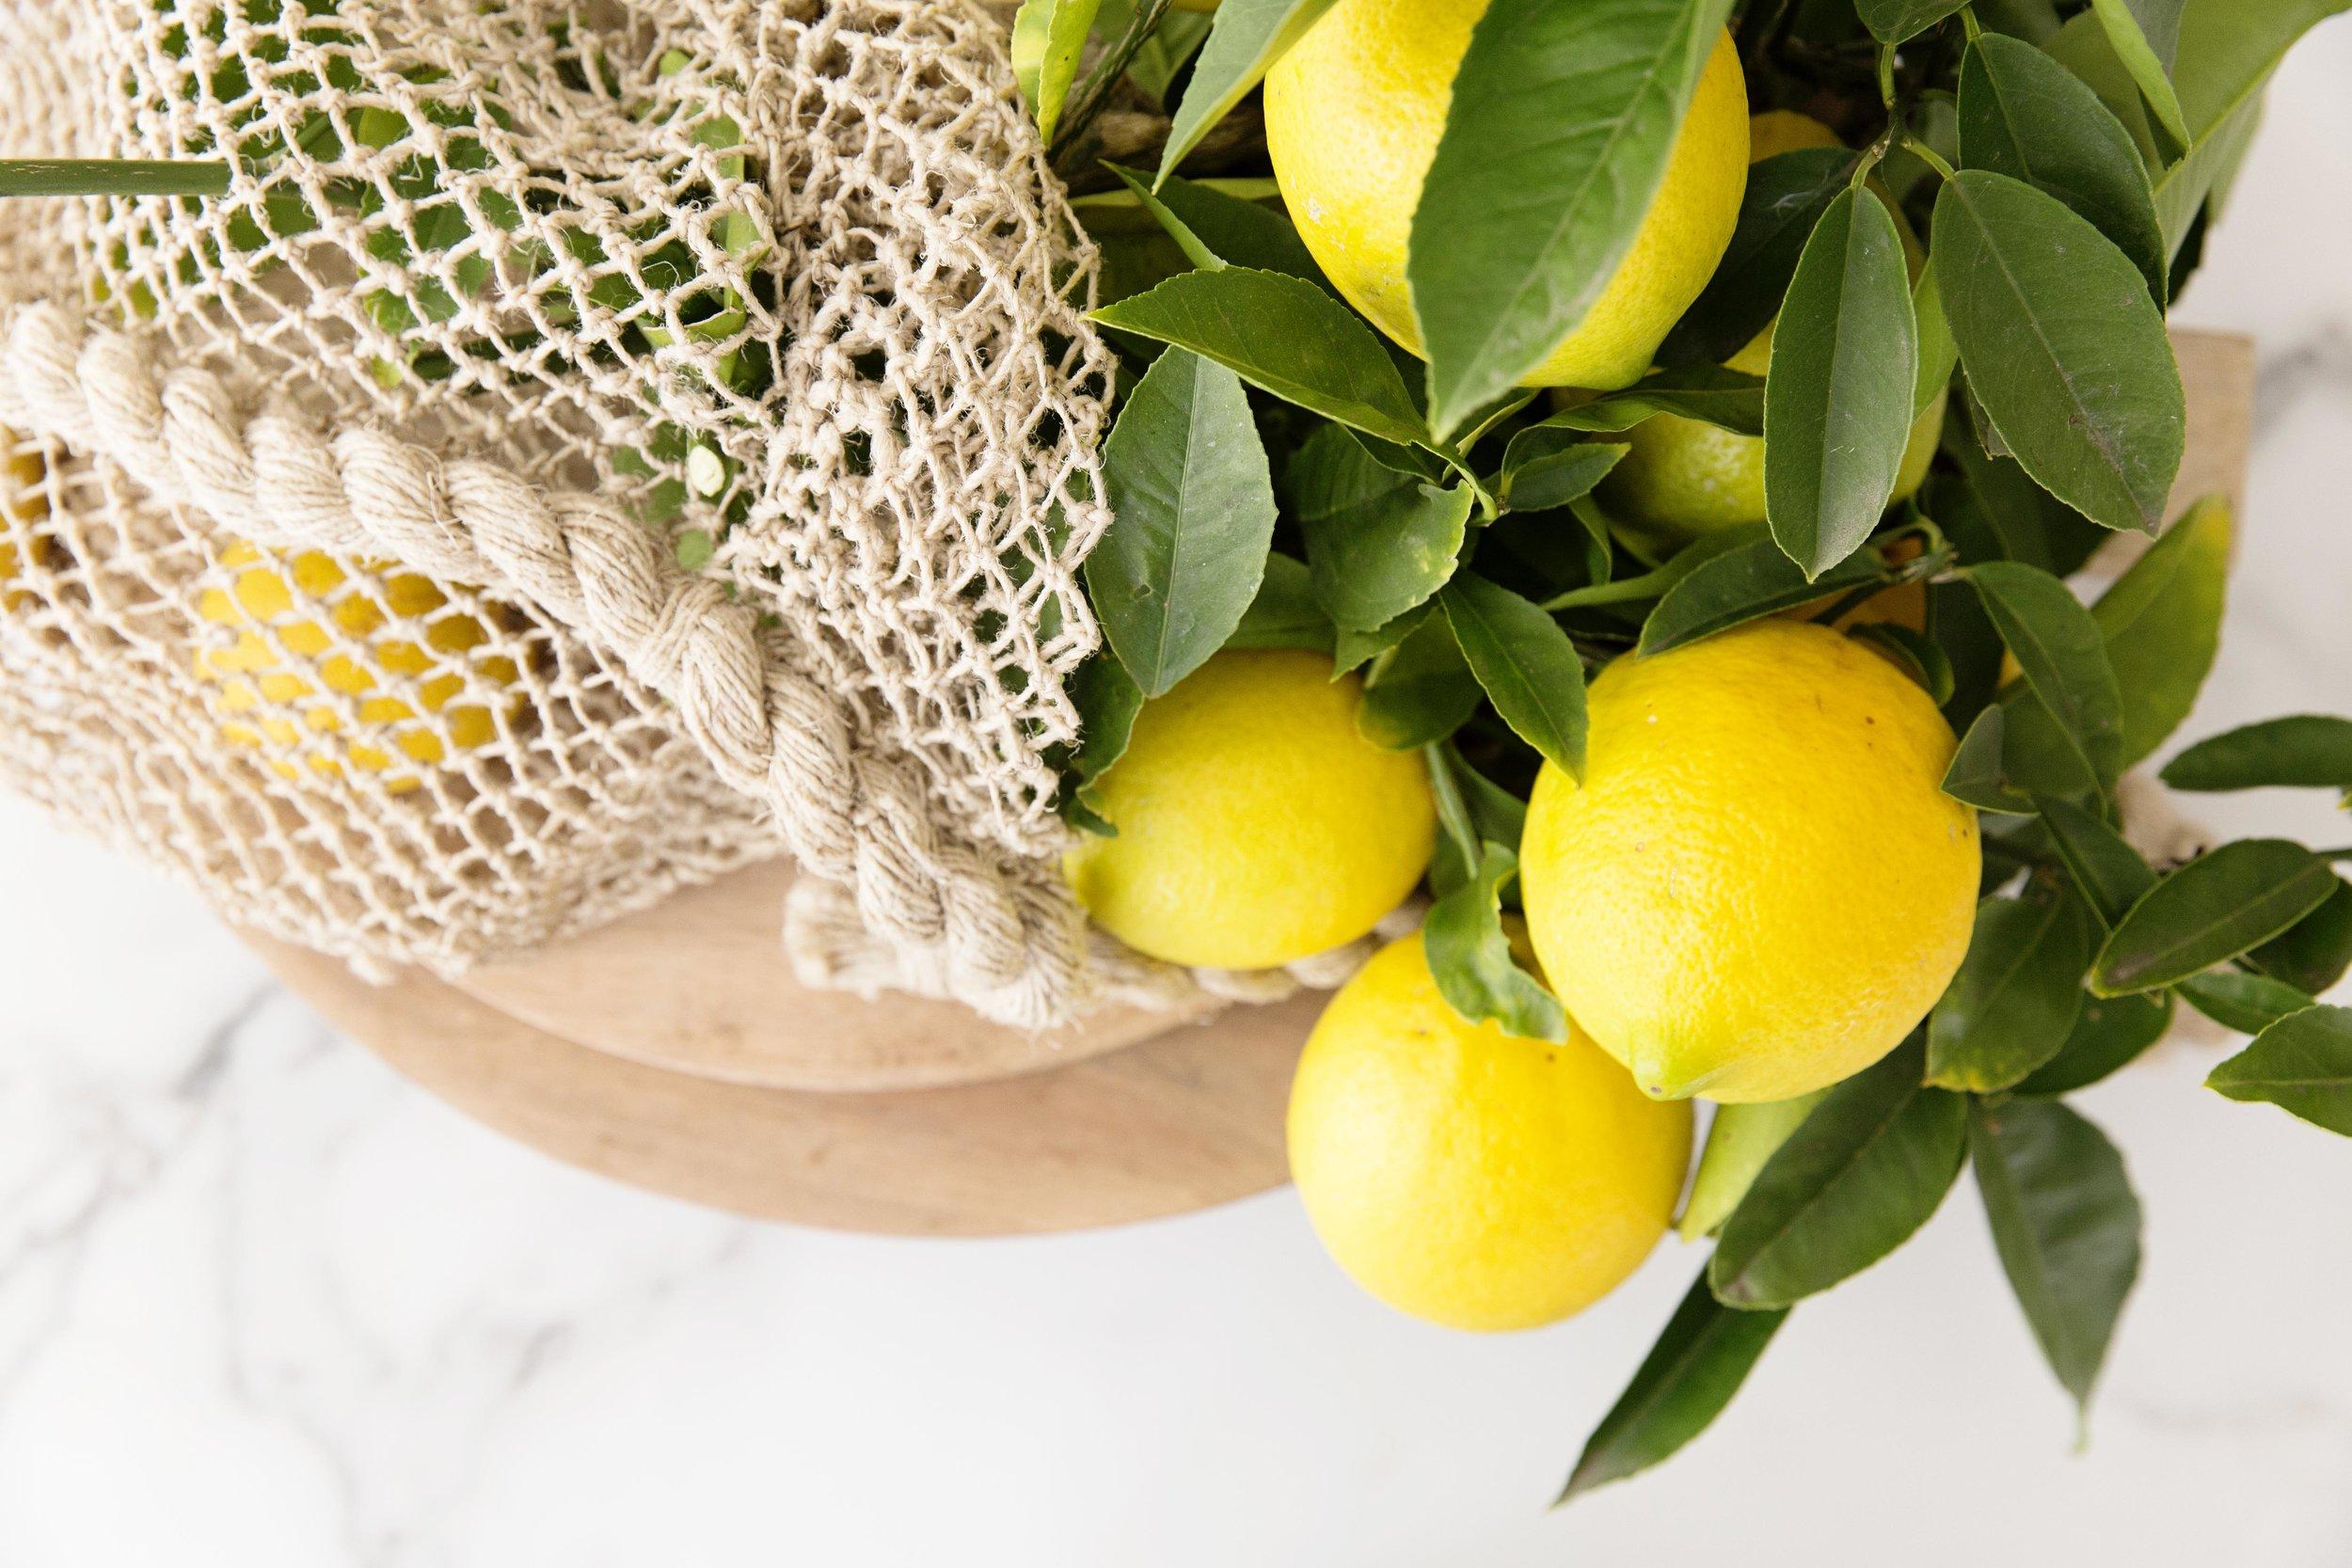 Lemon Bag 004.JPG